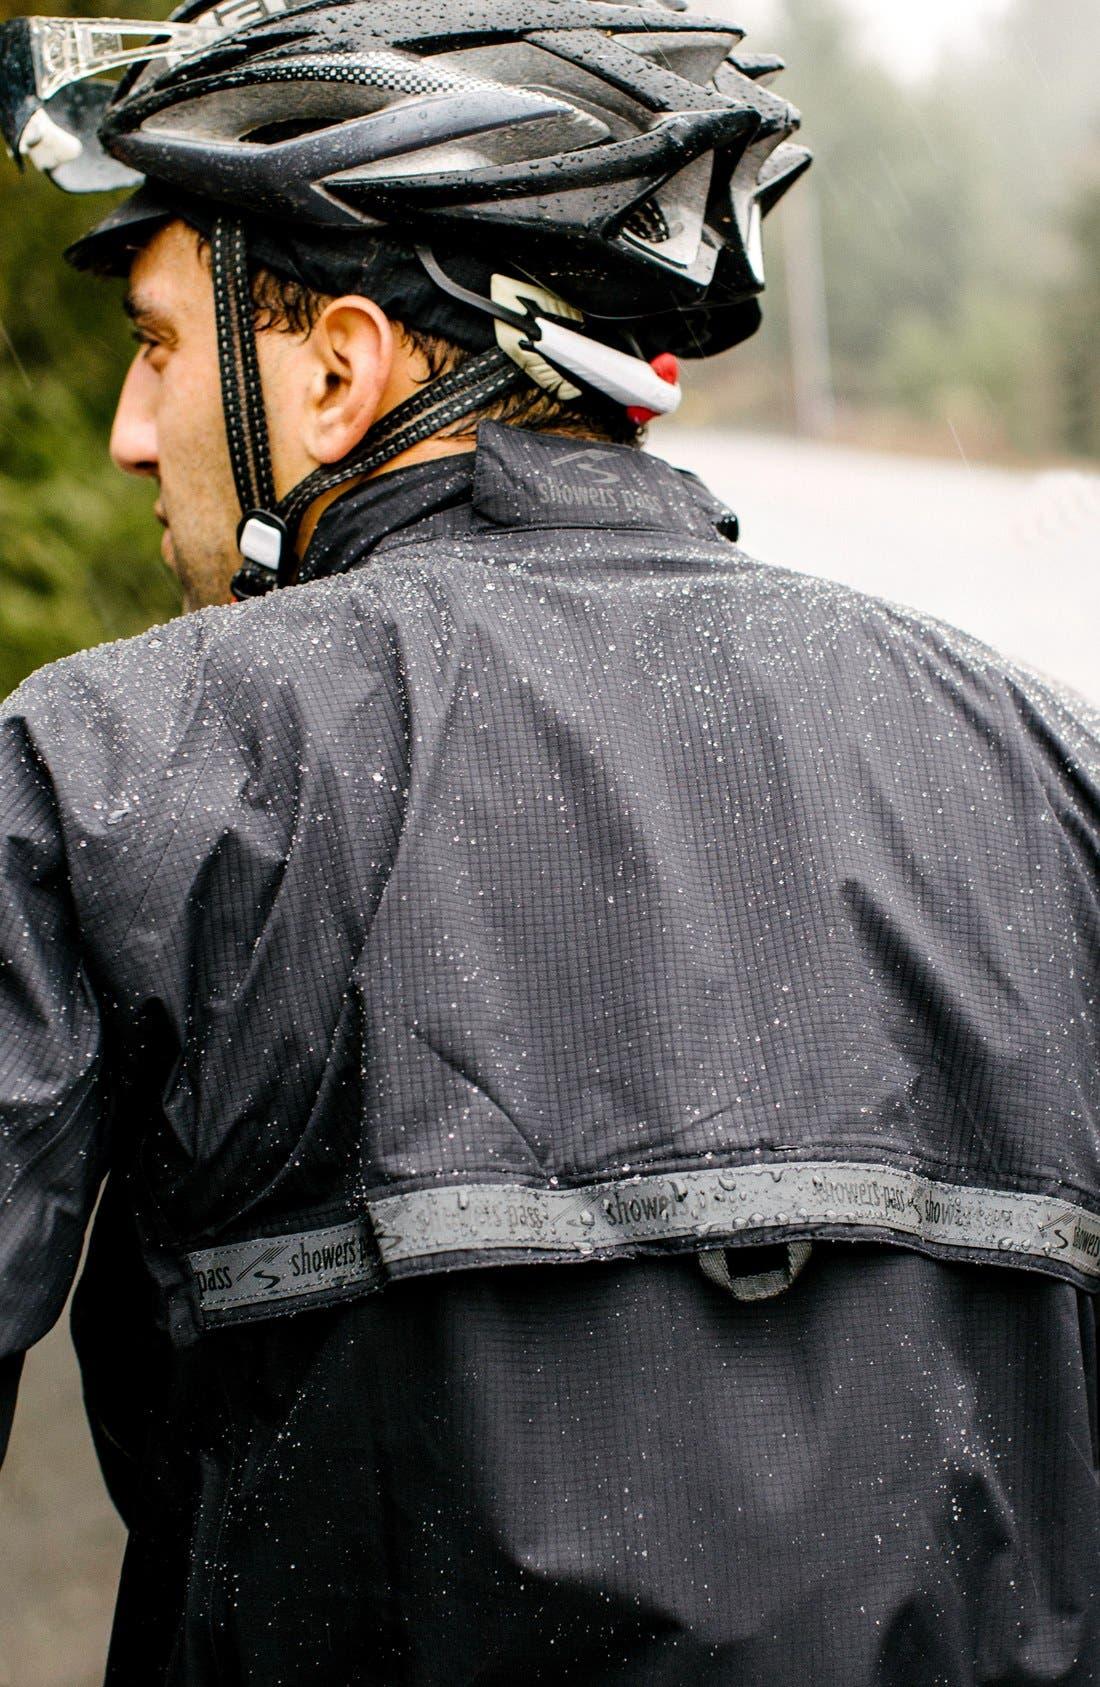 SHOWERS PASS,                             'Elite 2.1' Trim Fit Waterproof Hooded Jacket,                             Alternate thumbnail 6, color,                             001